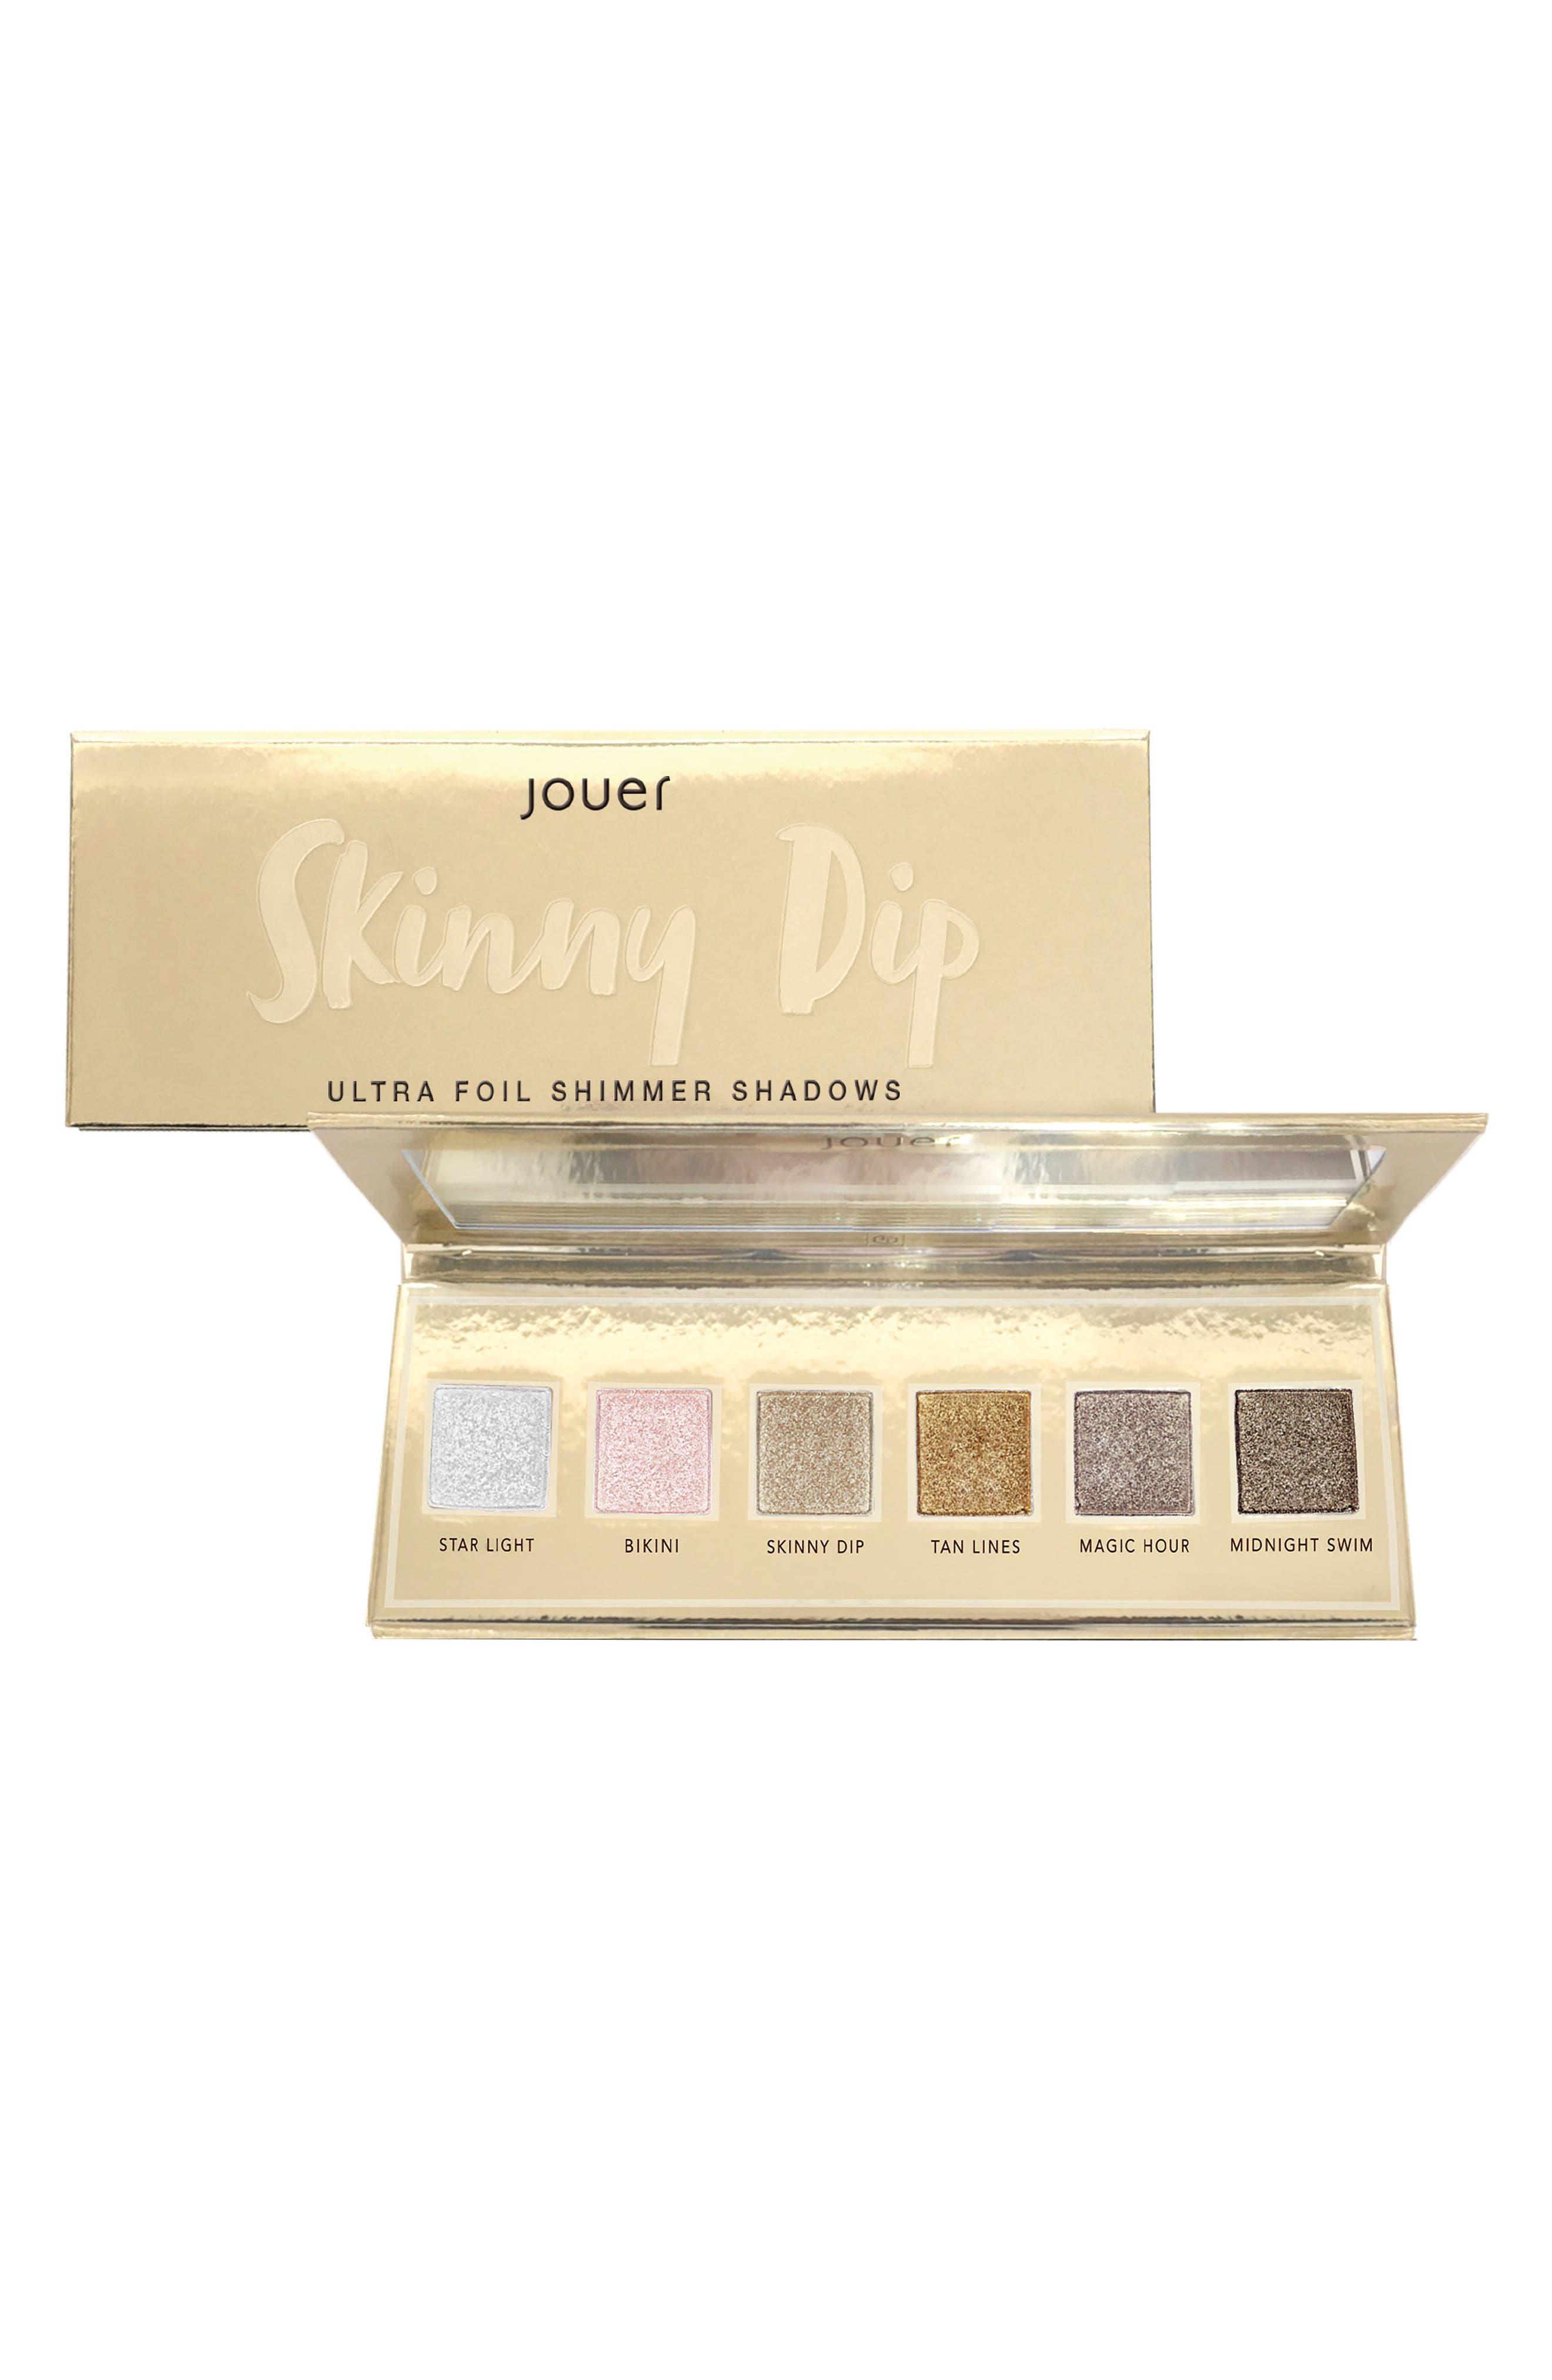 Main Image - Jouer Skinny Dip Ultra Foil Shimmer Shadows Palette